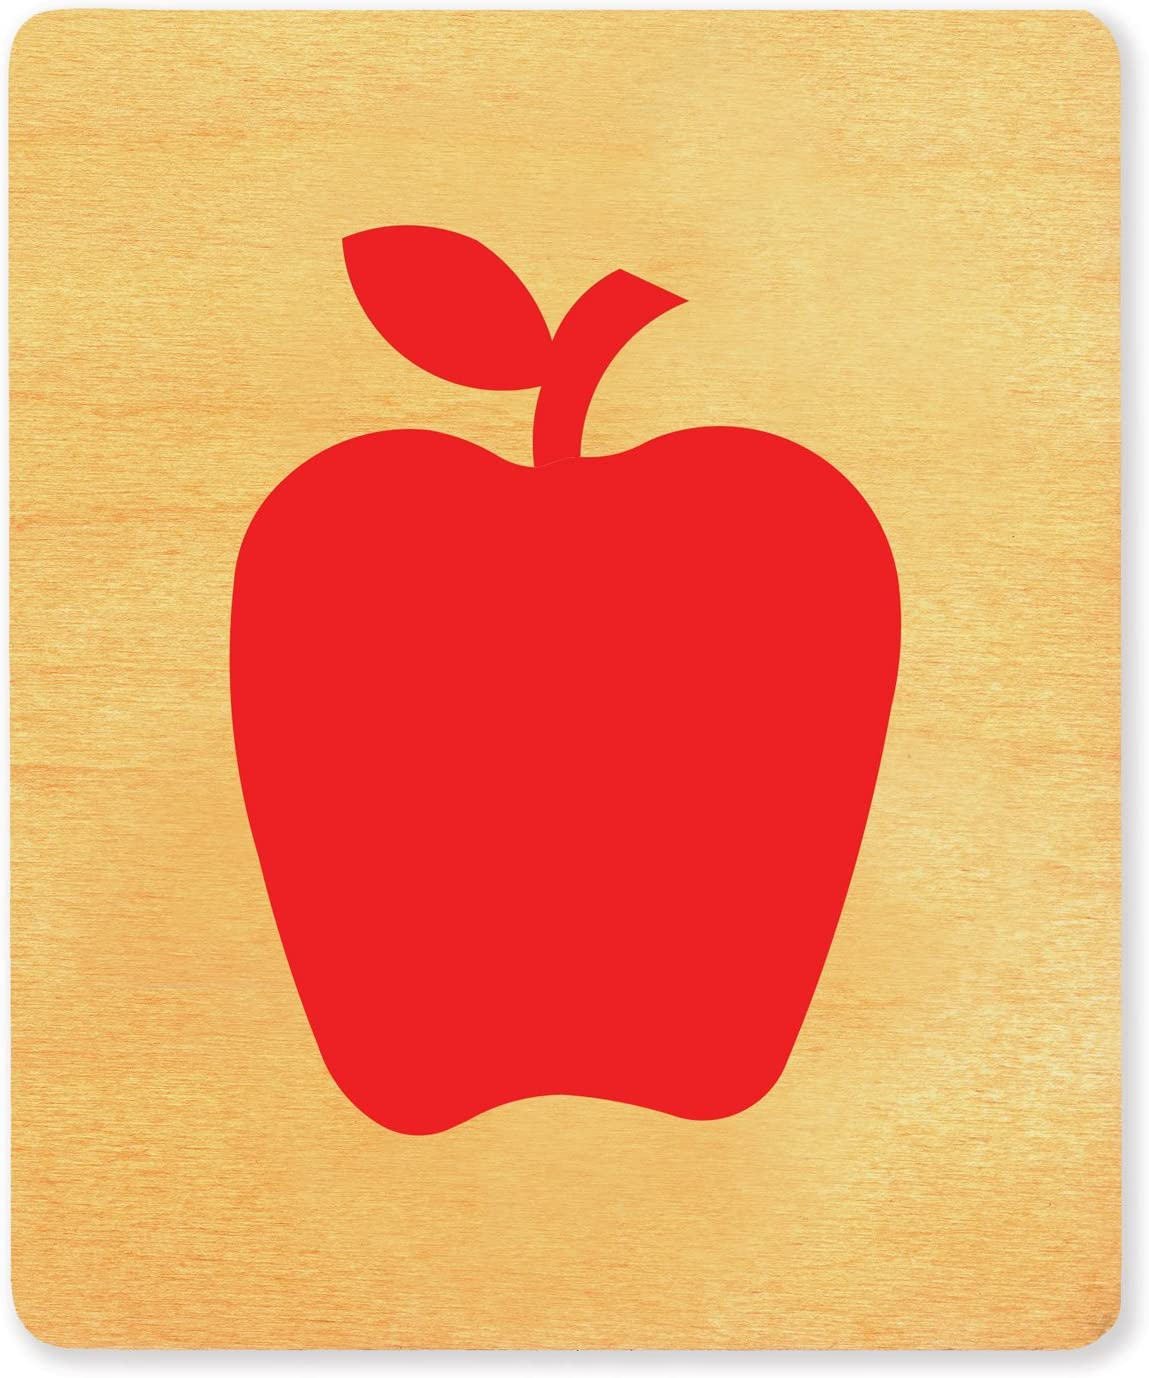 "Ellison SureCut Die 12078-LG, Apple, 5 7/8"" x 4 7/8"" x 1"""